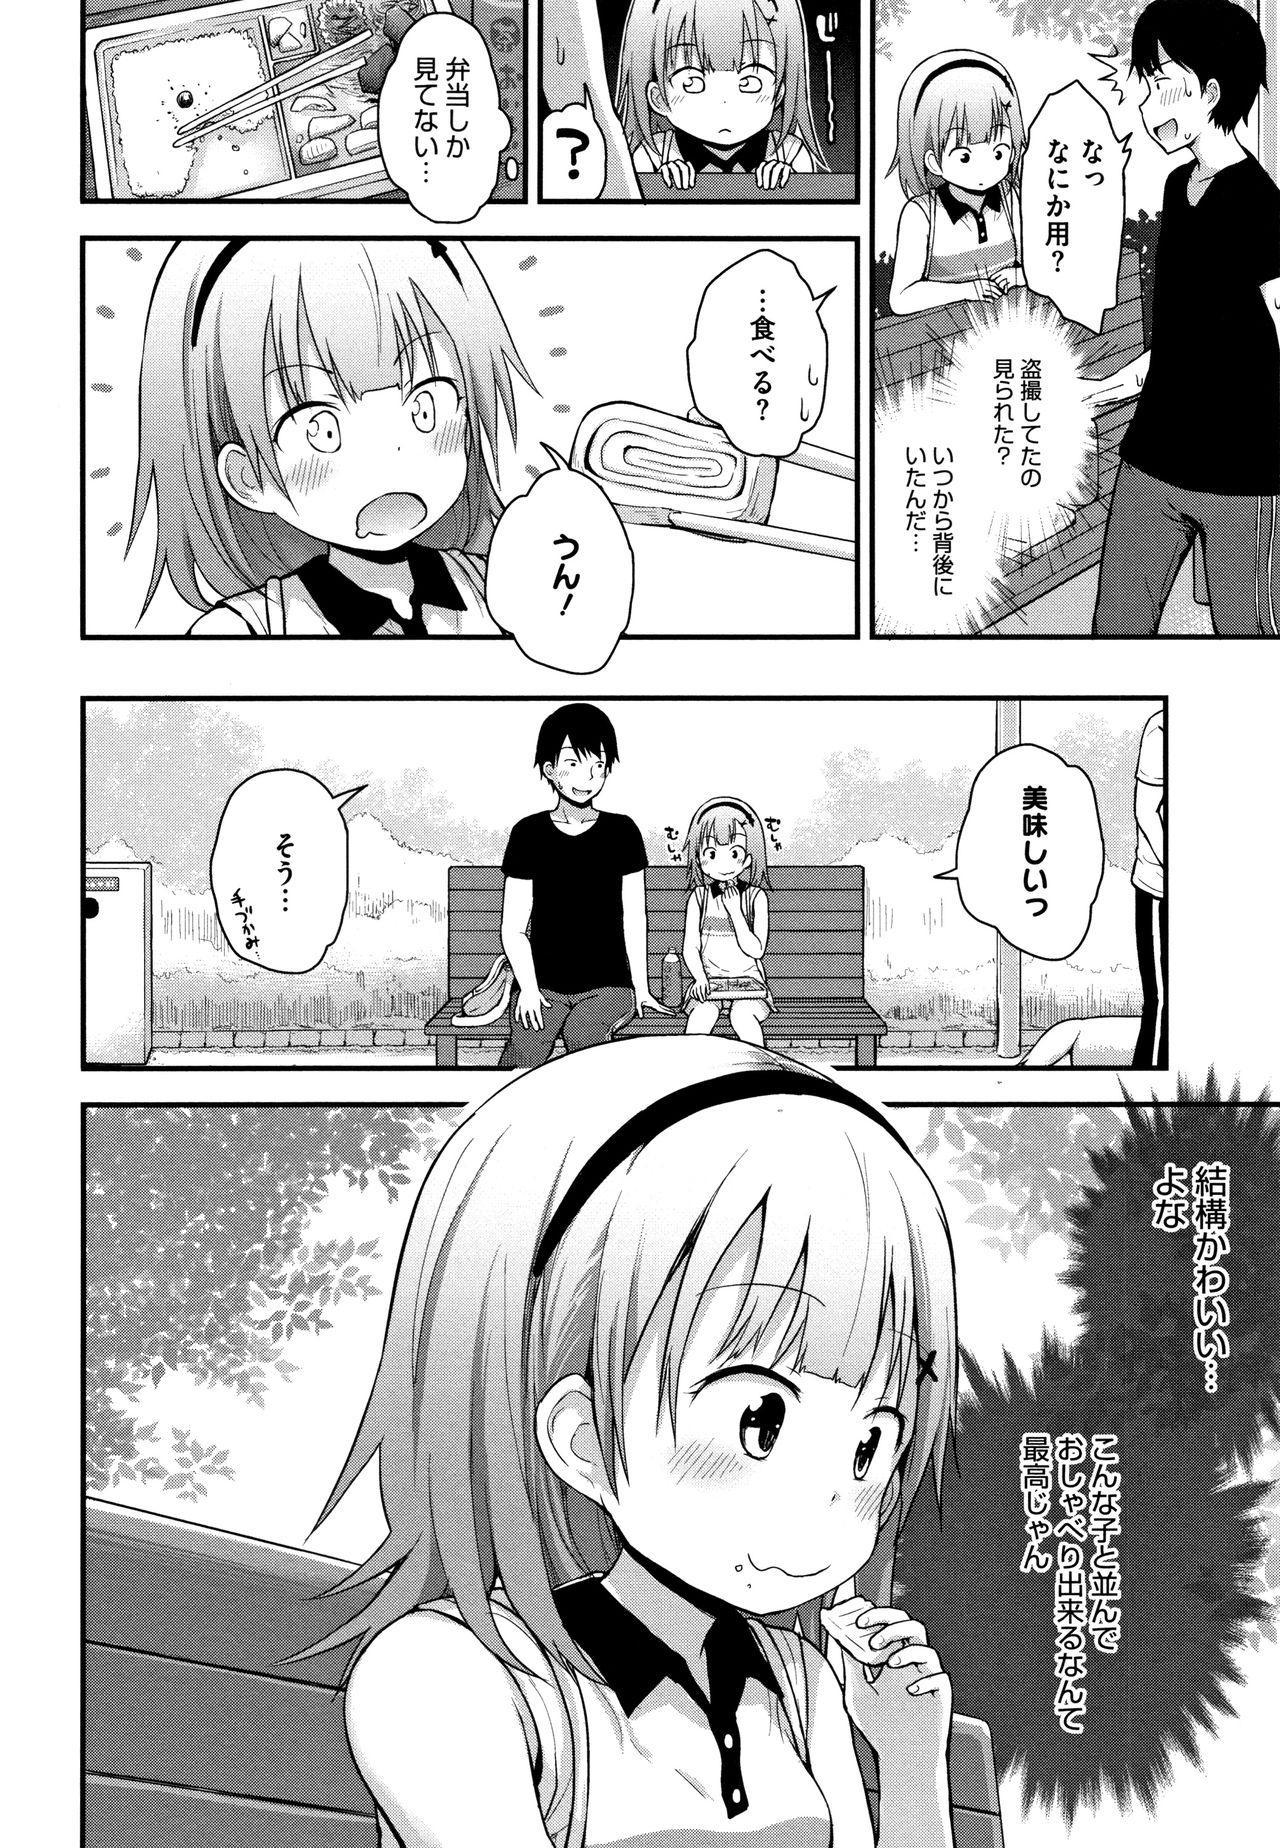 Chiisana Koukishin 6